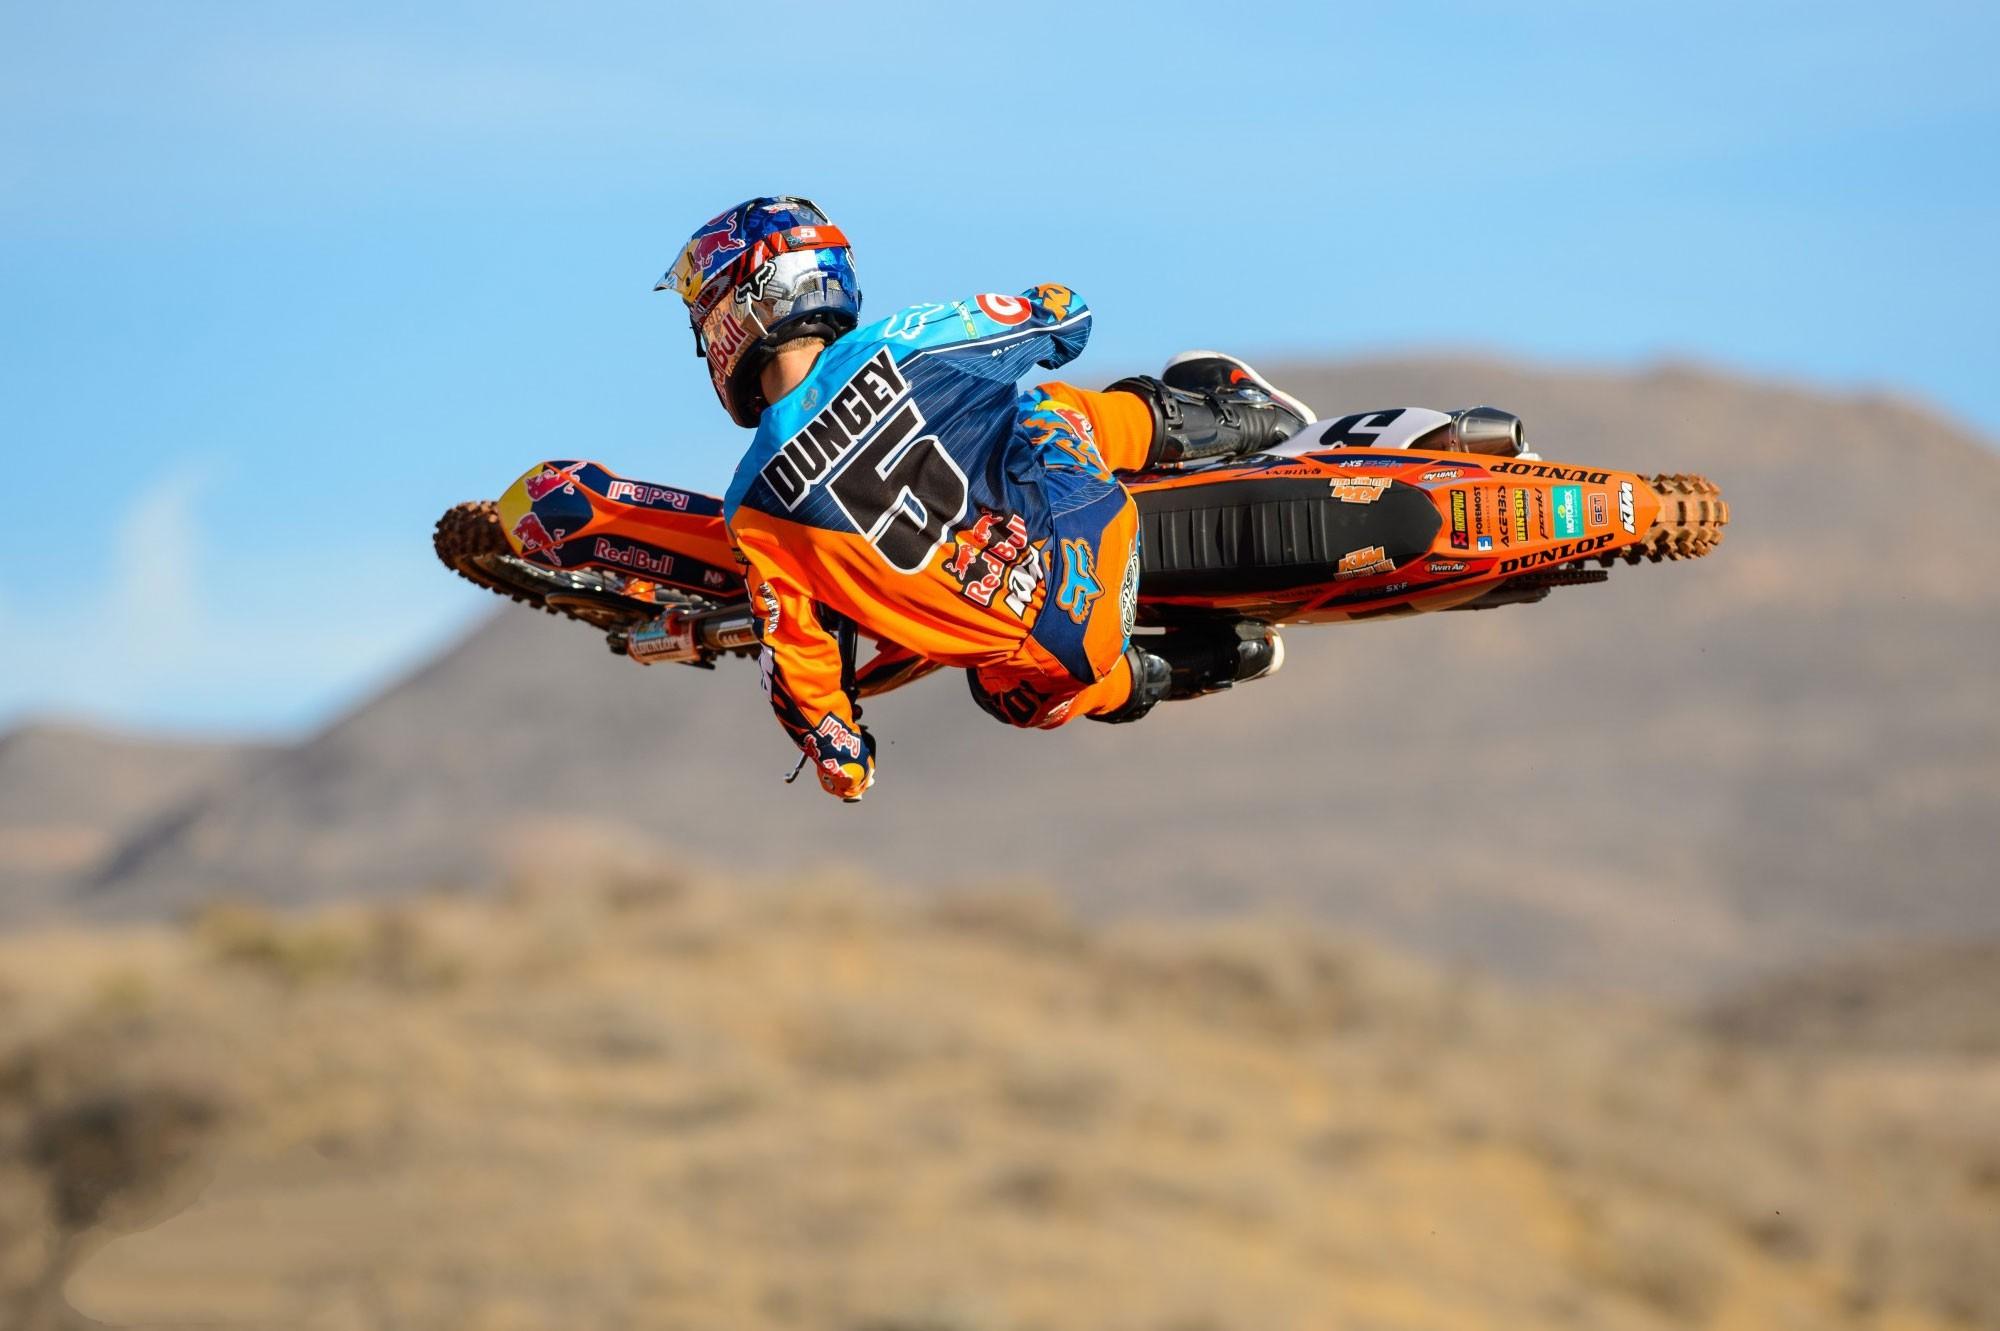 Motocross Ktm Image HD.